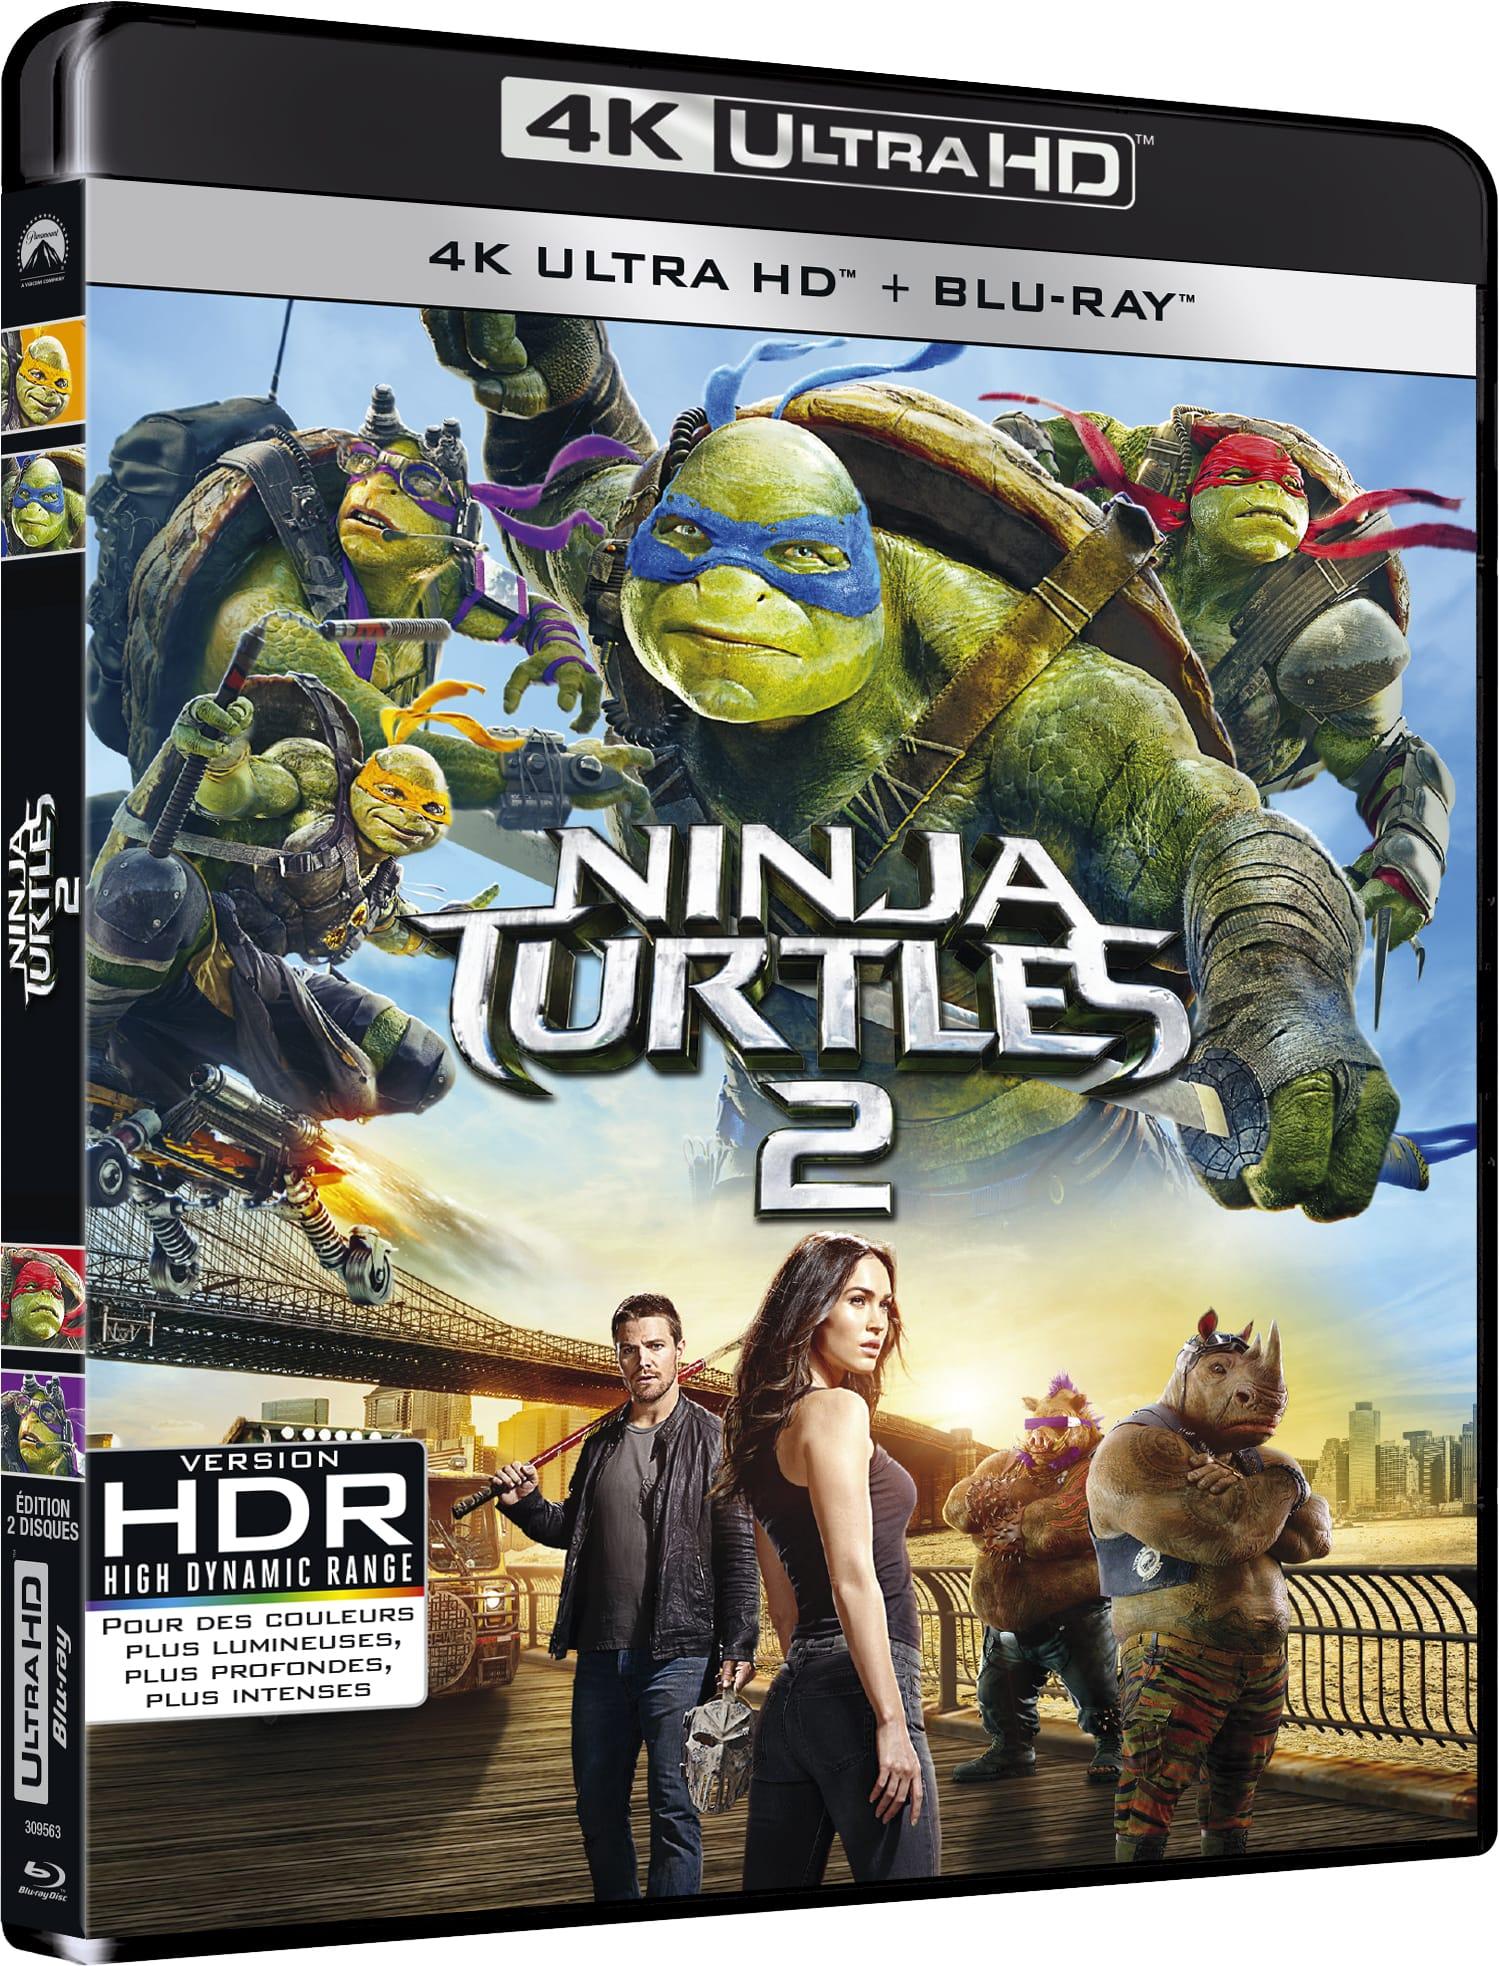 Ninja Turtles 2 Un Blu Ray 4k Cowabunga Tests Blu Ray 4k Ultra